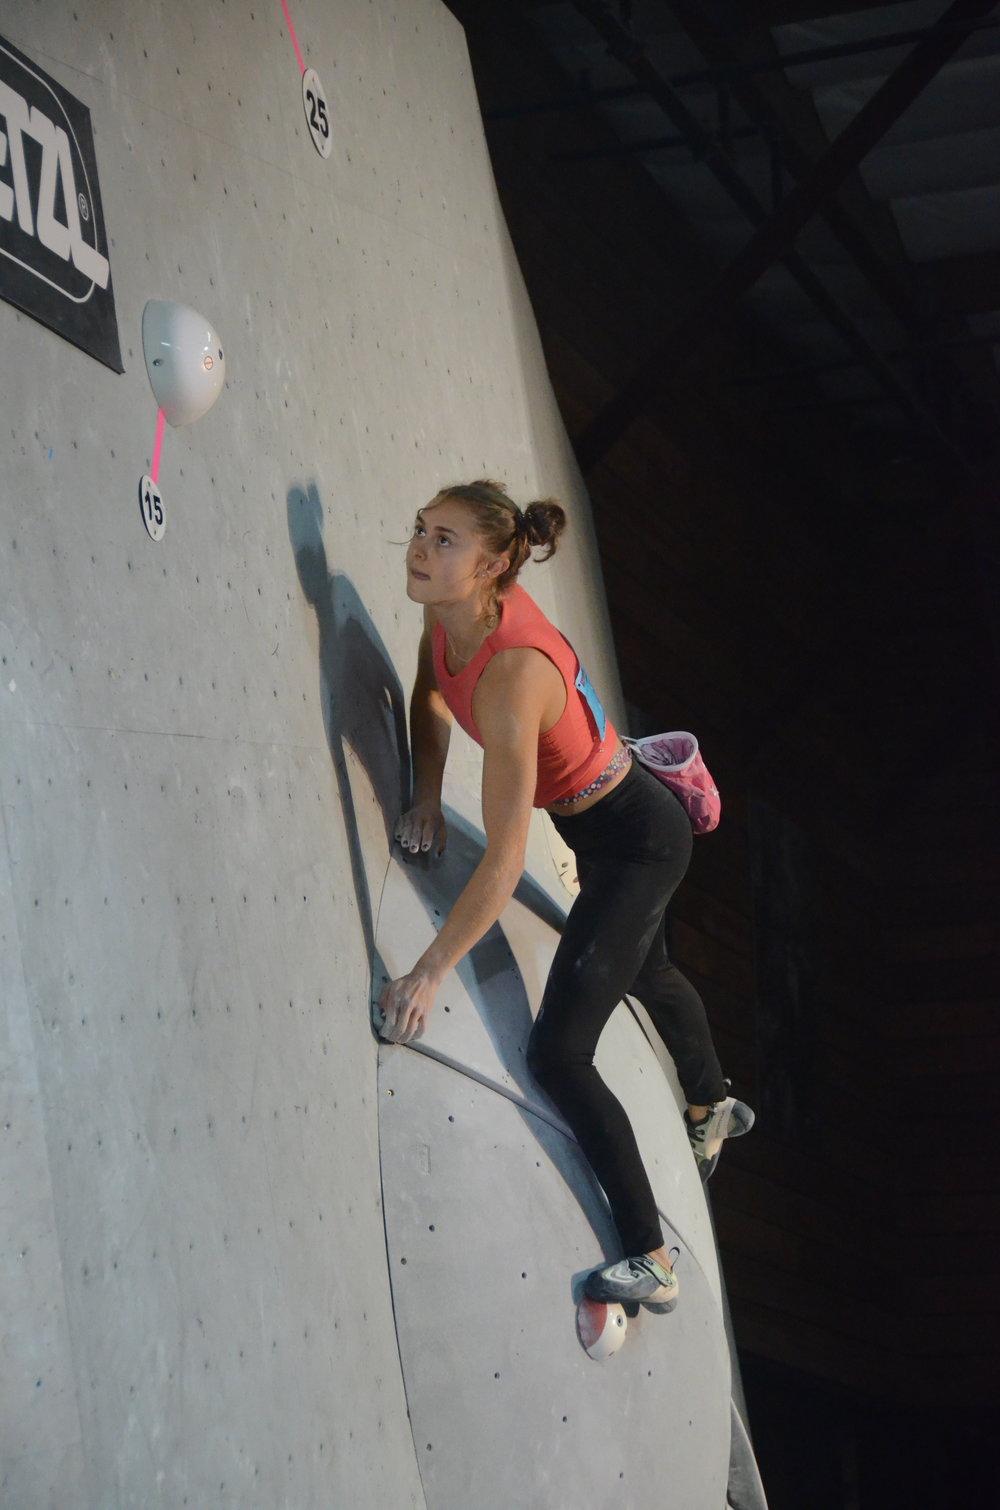 Margo Hayes - Taking it slow on the infamous Mesa Rim Academy slab.